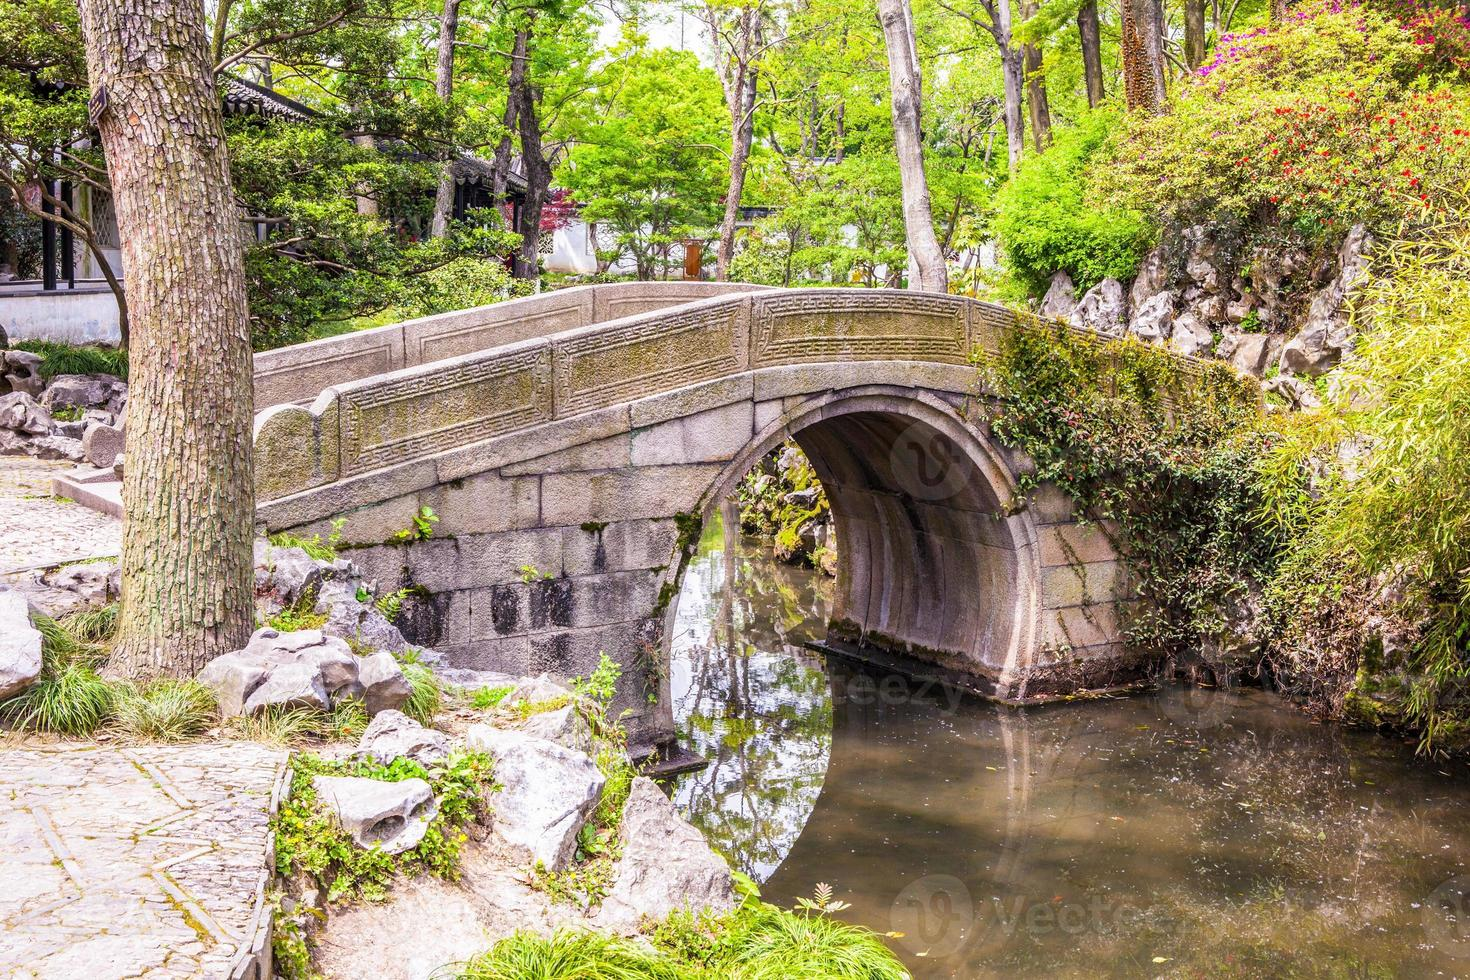 umile giardino dell'amministratore (zhuozheng) foto